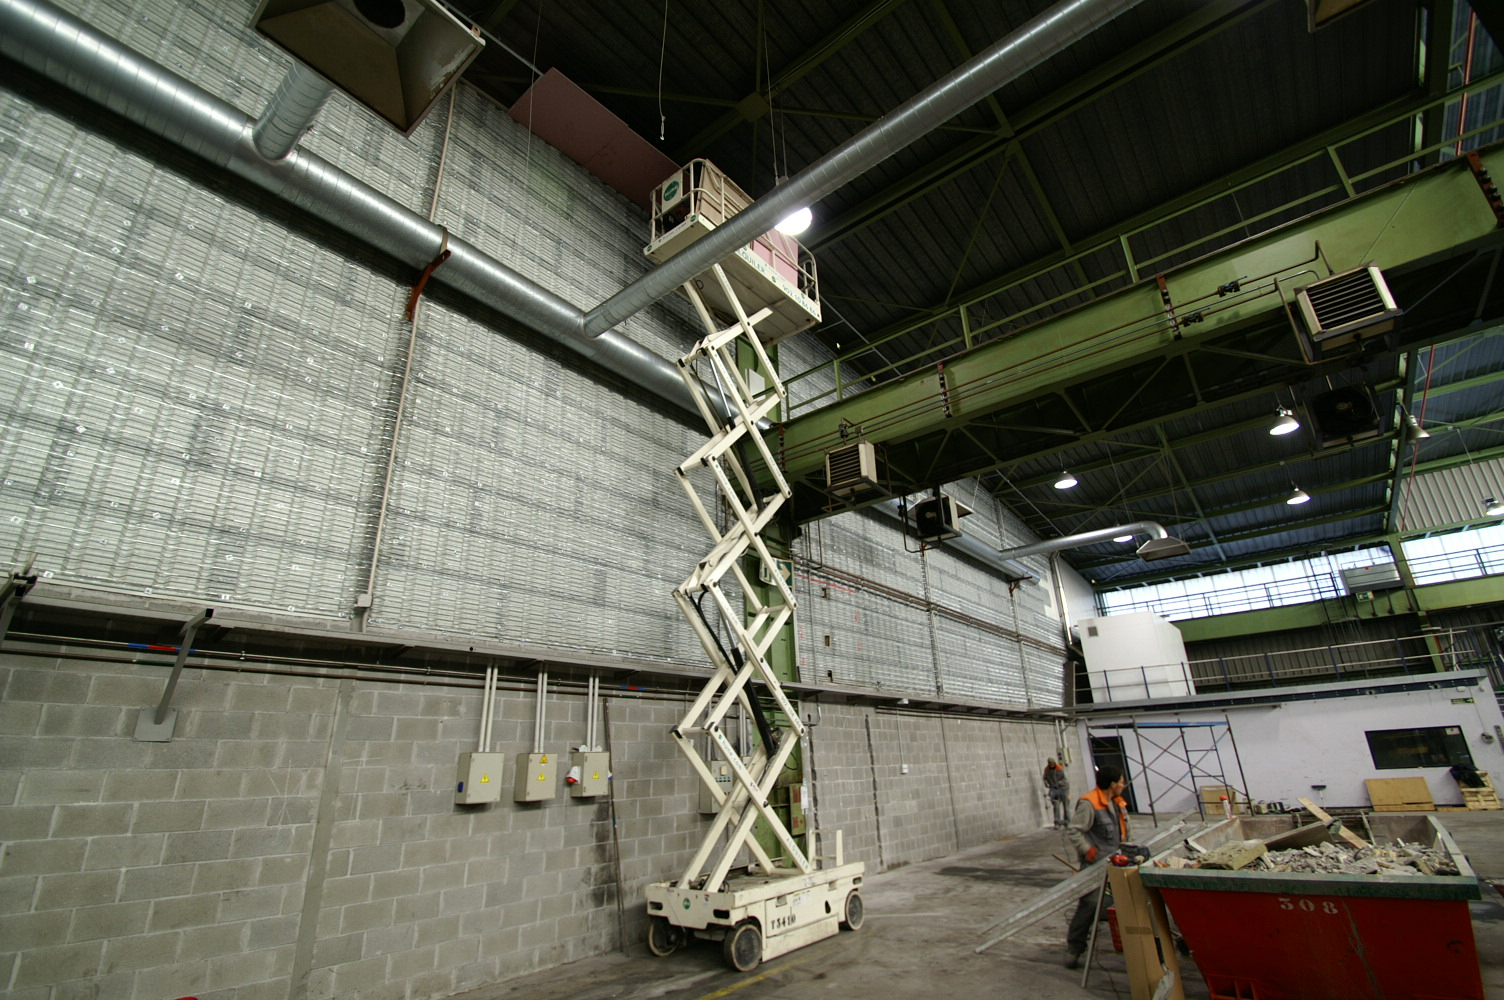 Instalacion franja EI60 1m ancho